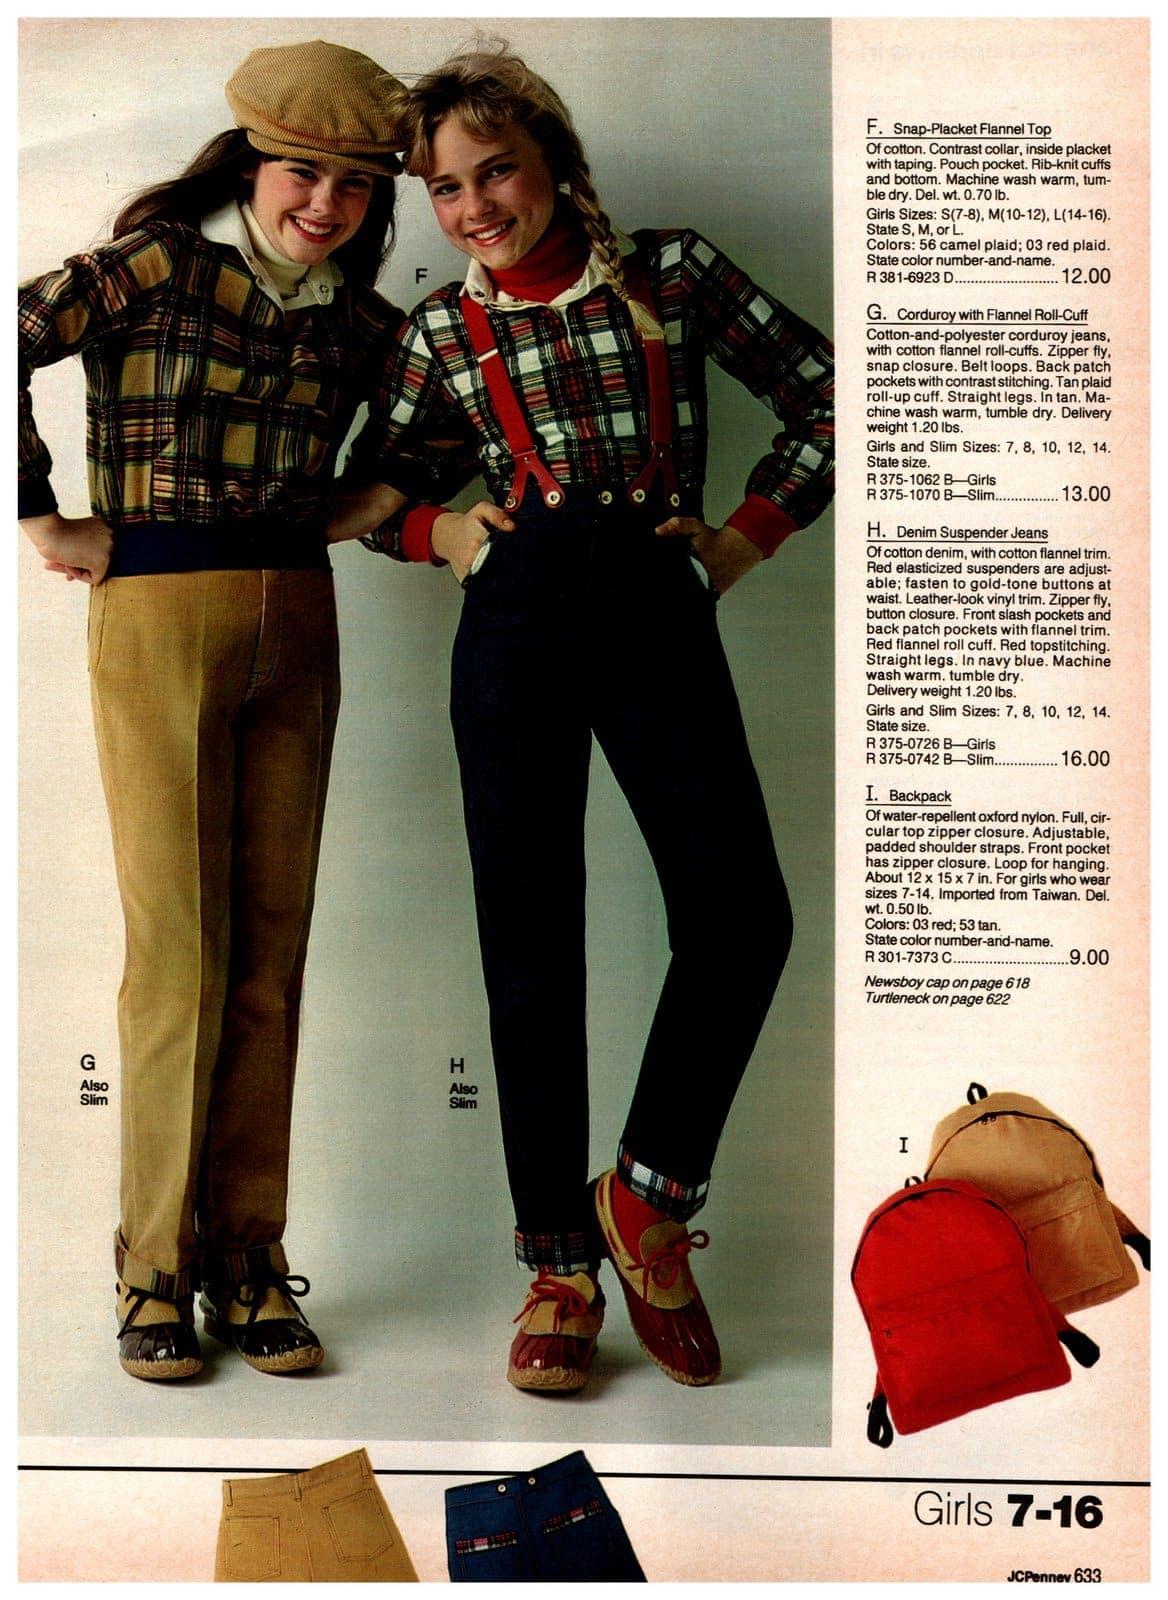 Plaid flannel tops, vintage corduroy pants, suspenders, jeans and backpacks